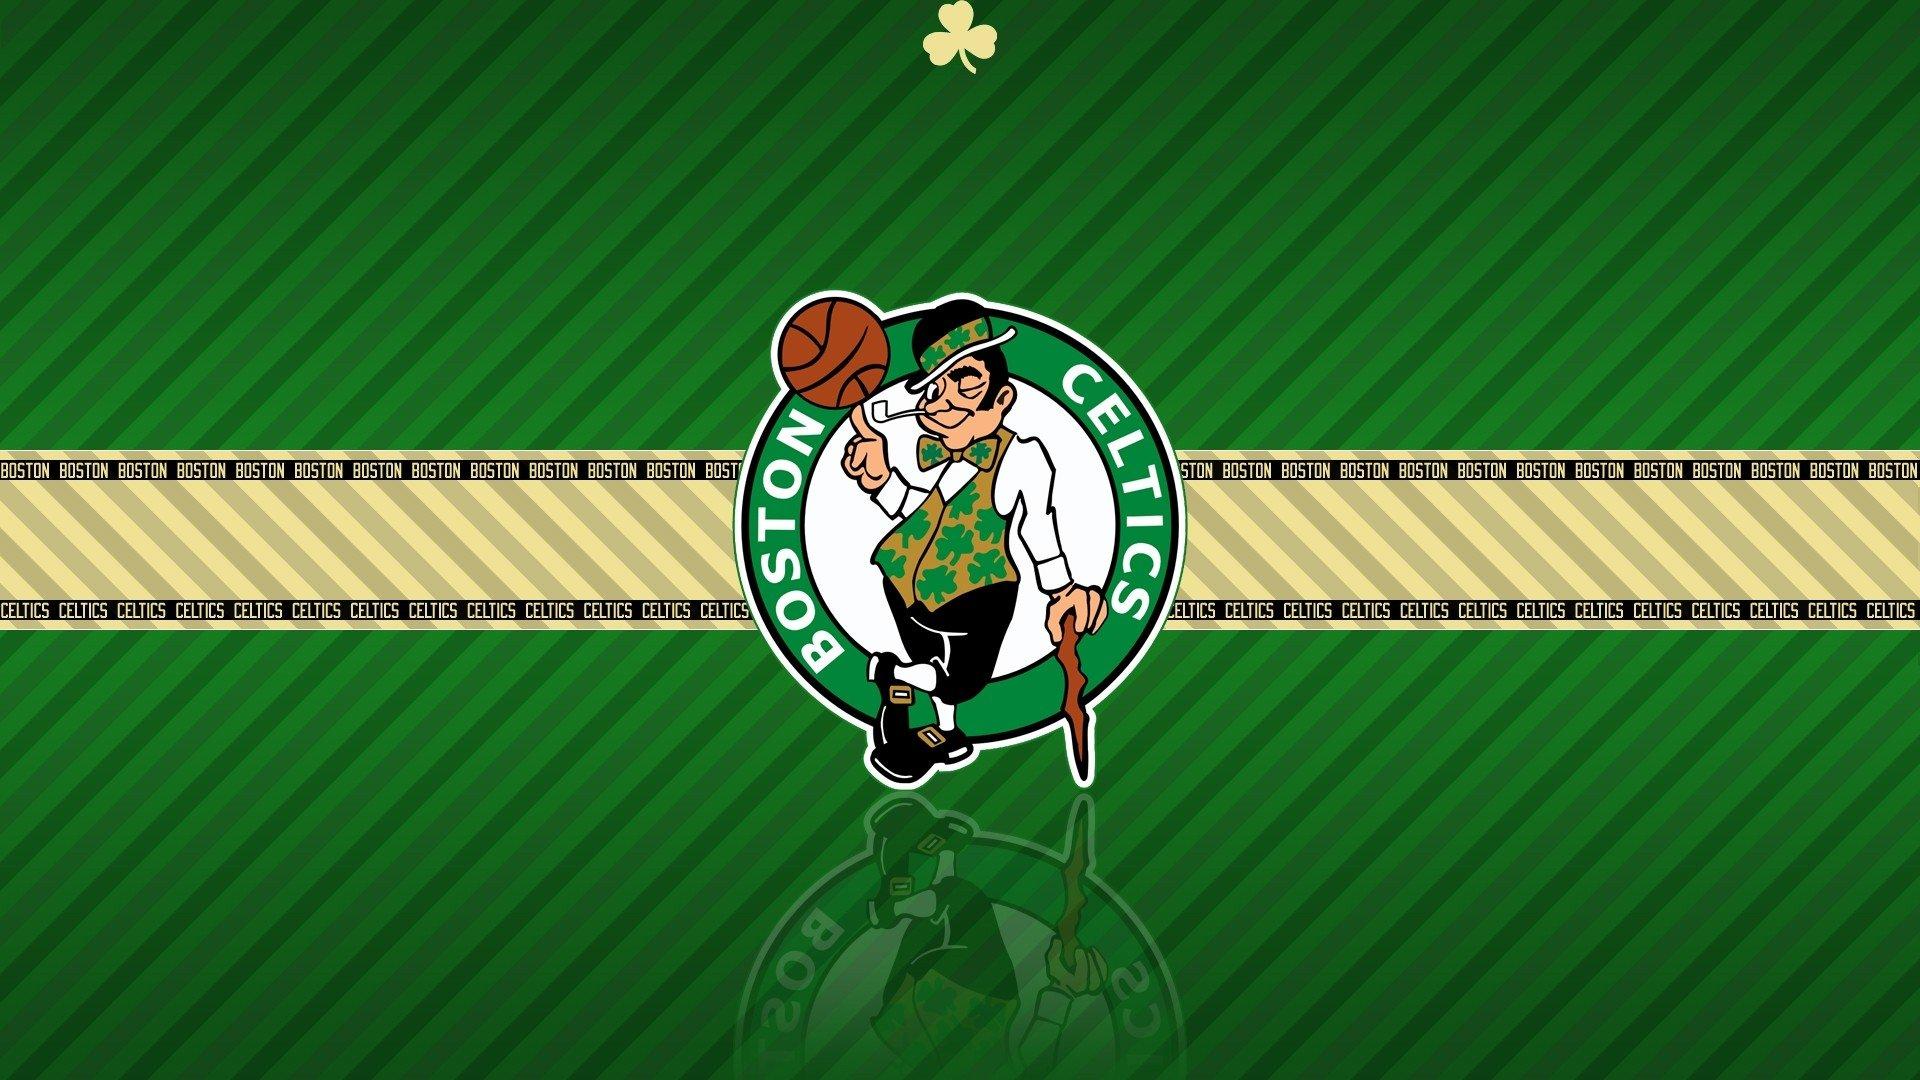 Lrg Iphone 5 Wallpaper Boston Celtics Fond D 233 Cran Hd Arri 232 Re Plan 1920x1080